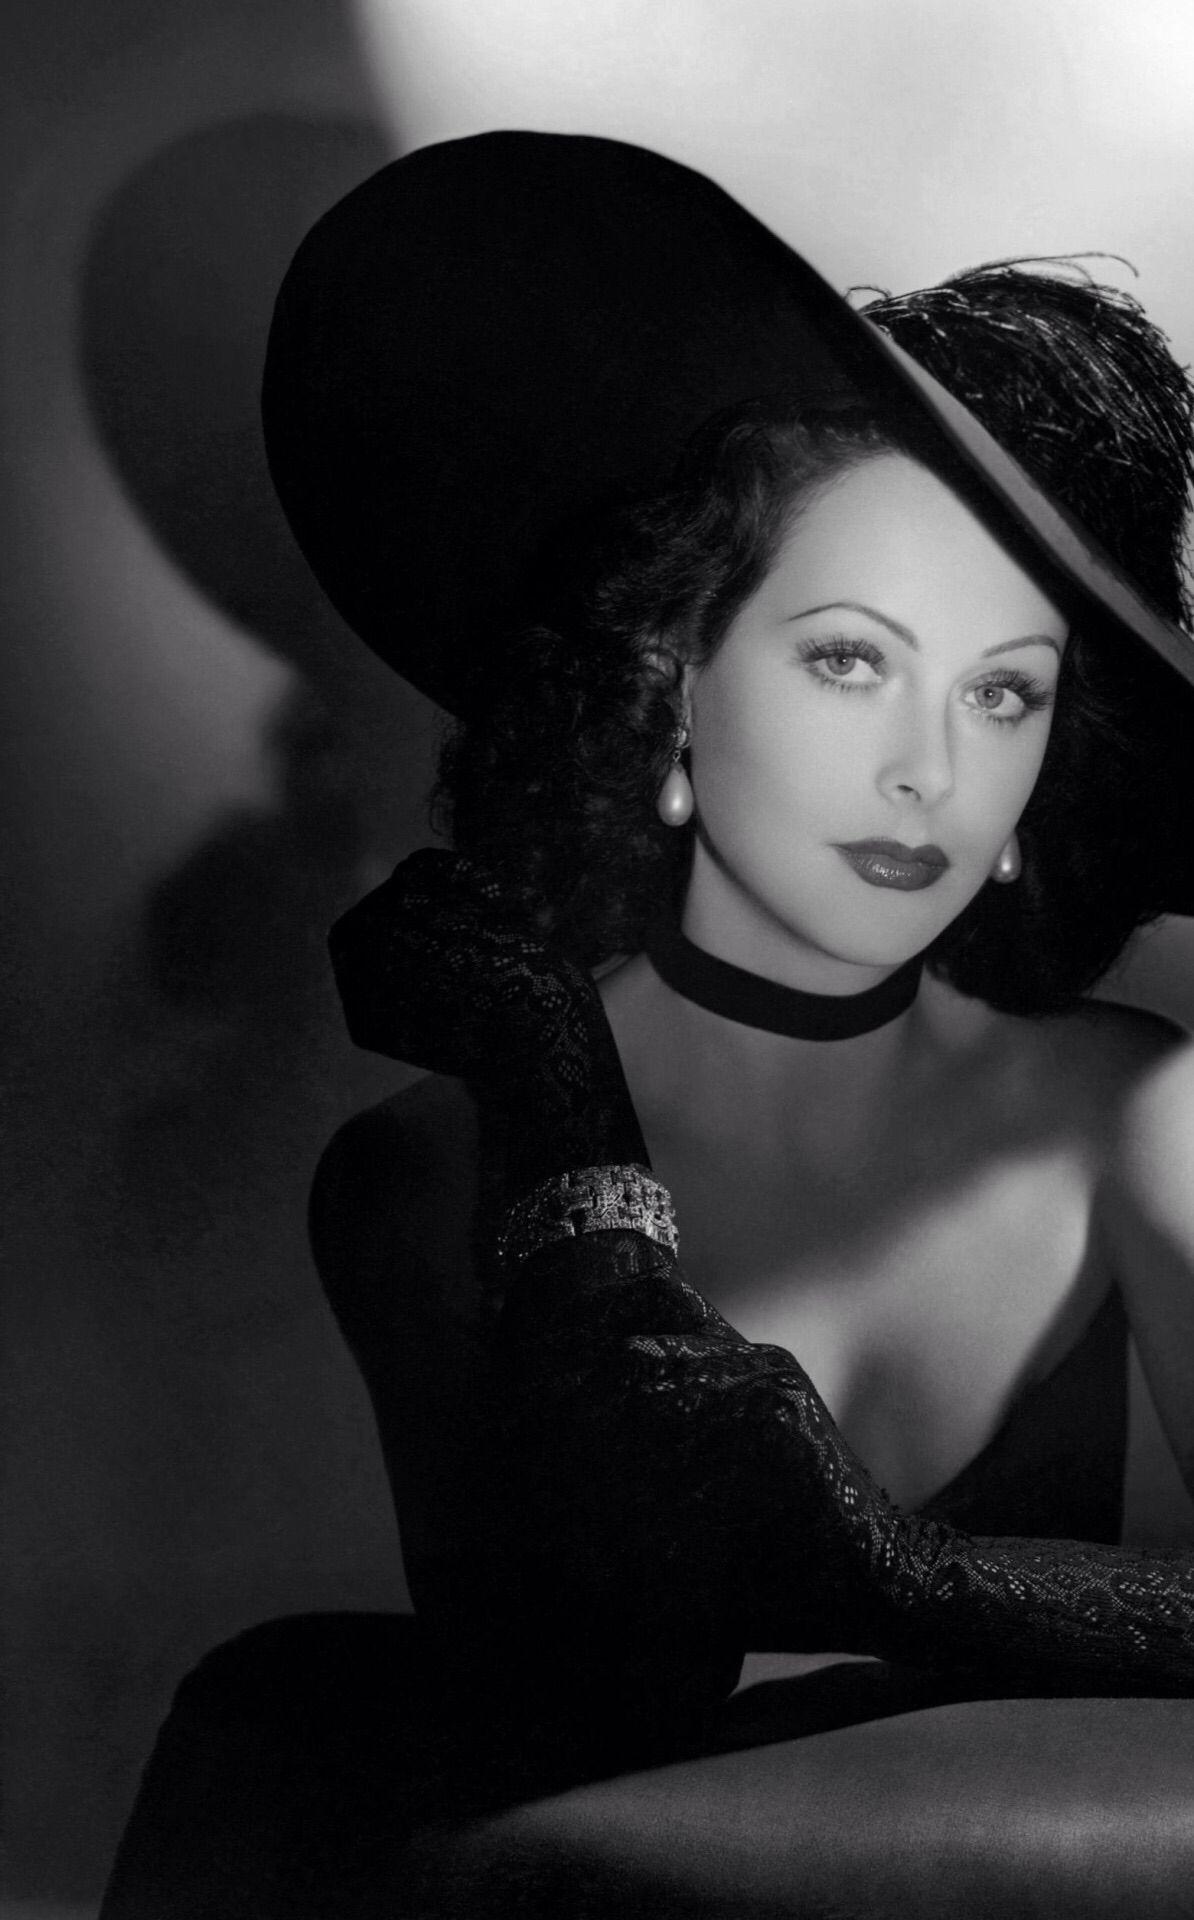 Heddy Lamar Hollywood Glamour Photography Vintage Hollywood Glamour Old Hollywood Glamour